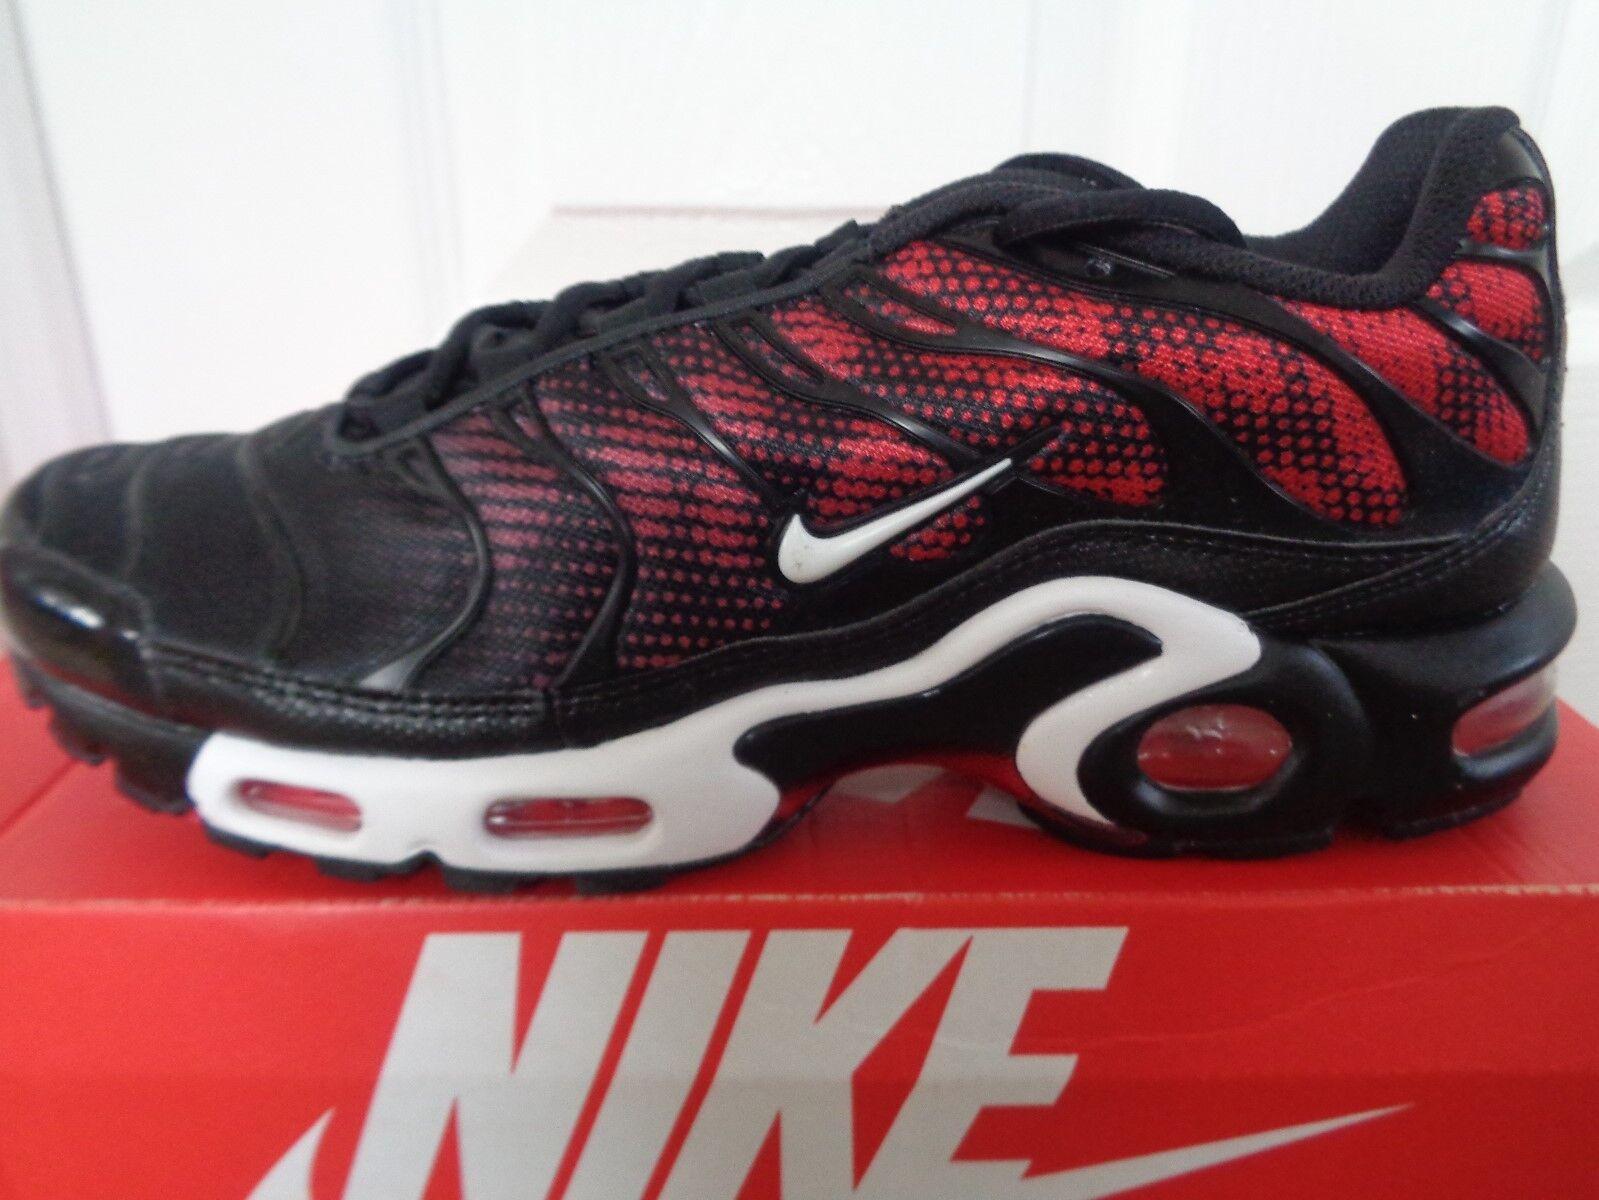 Nike Air Max Zapatillas zapatillas 647315 016 Plus TXT UK